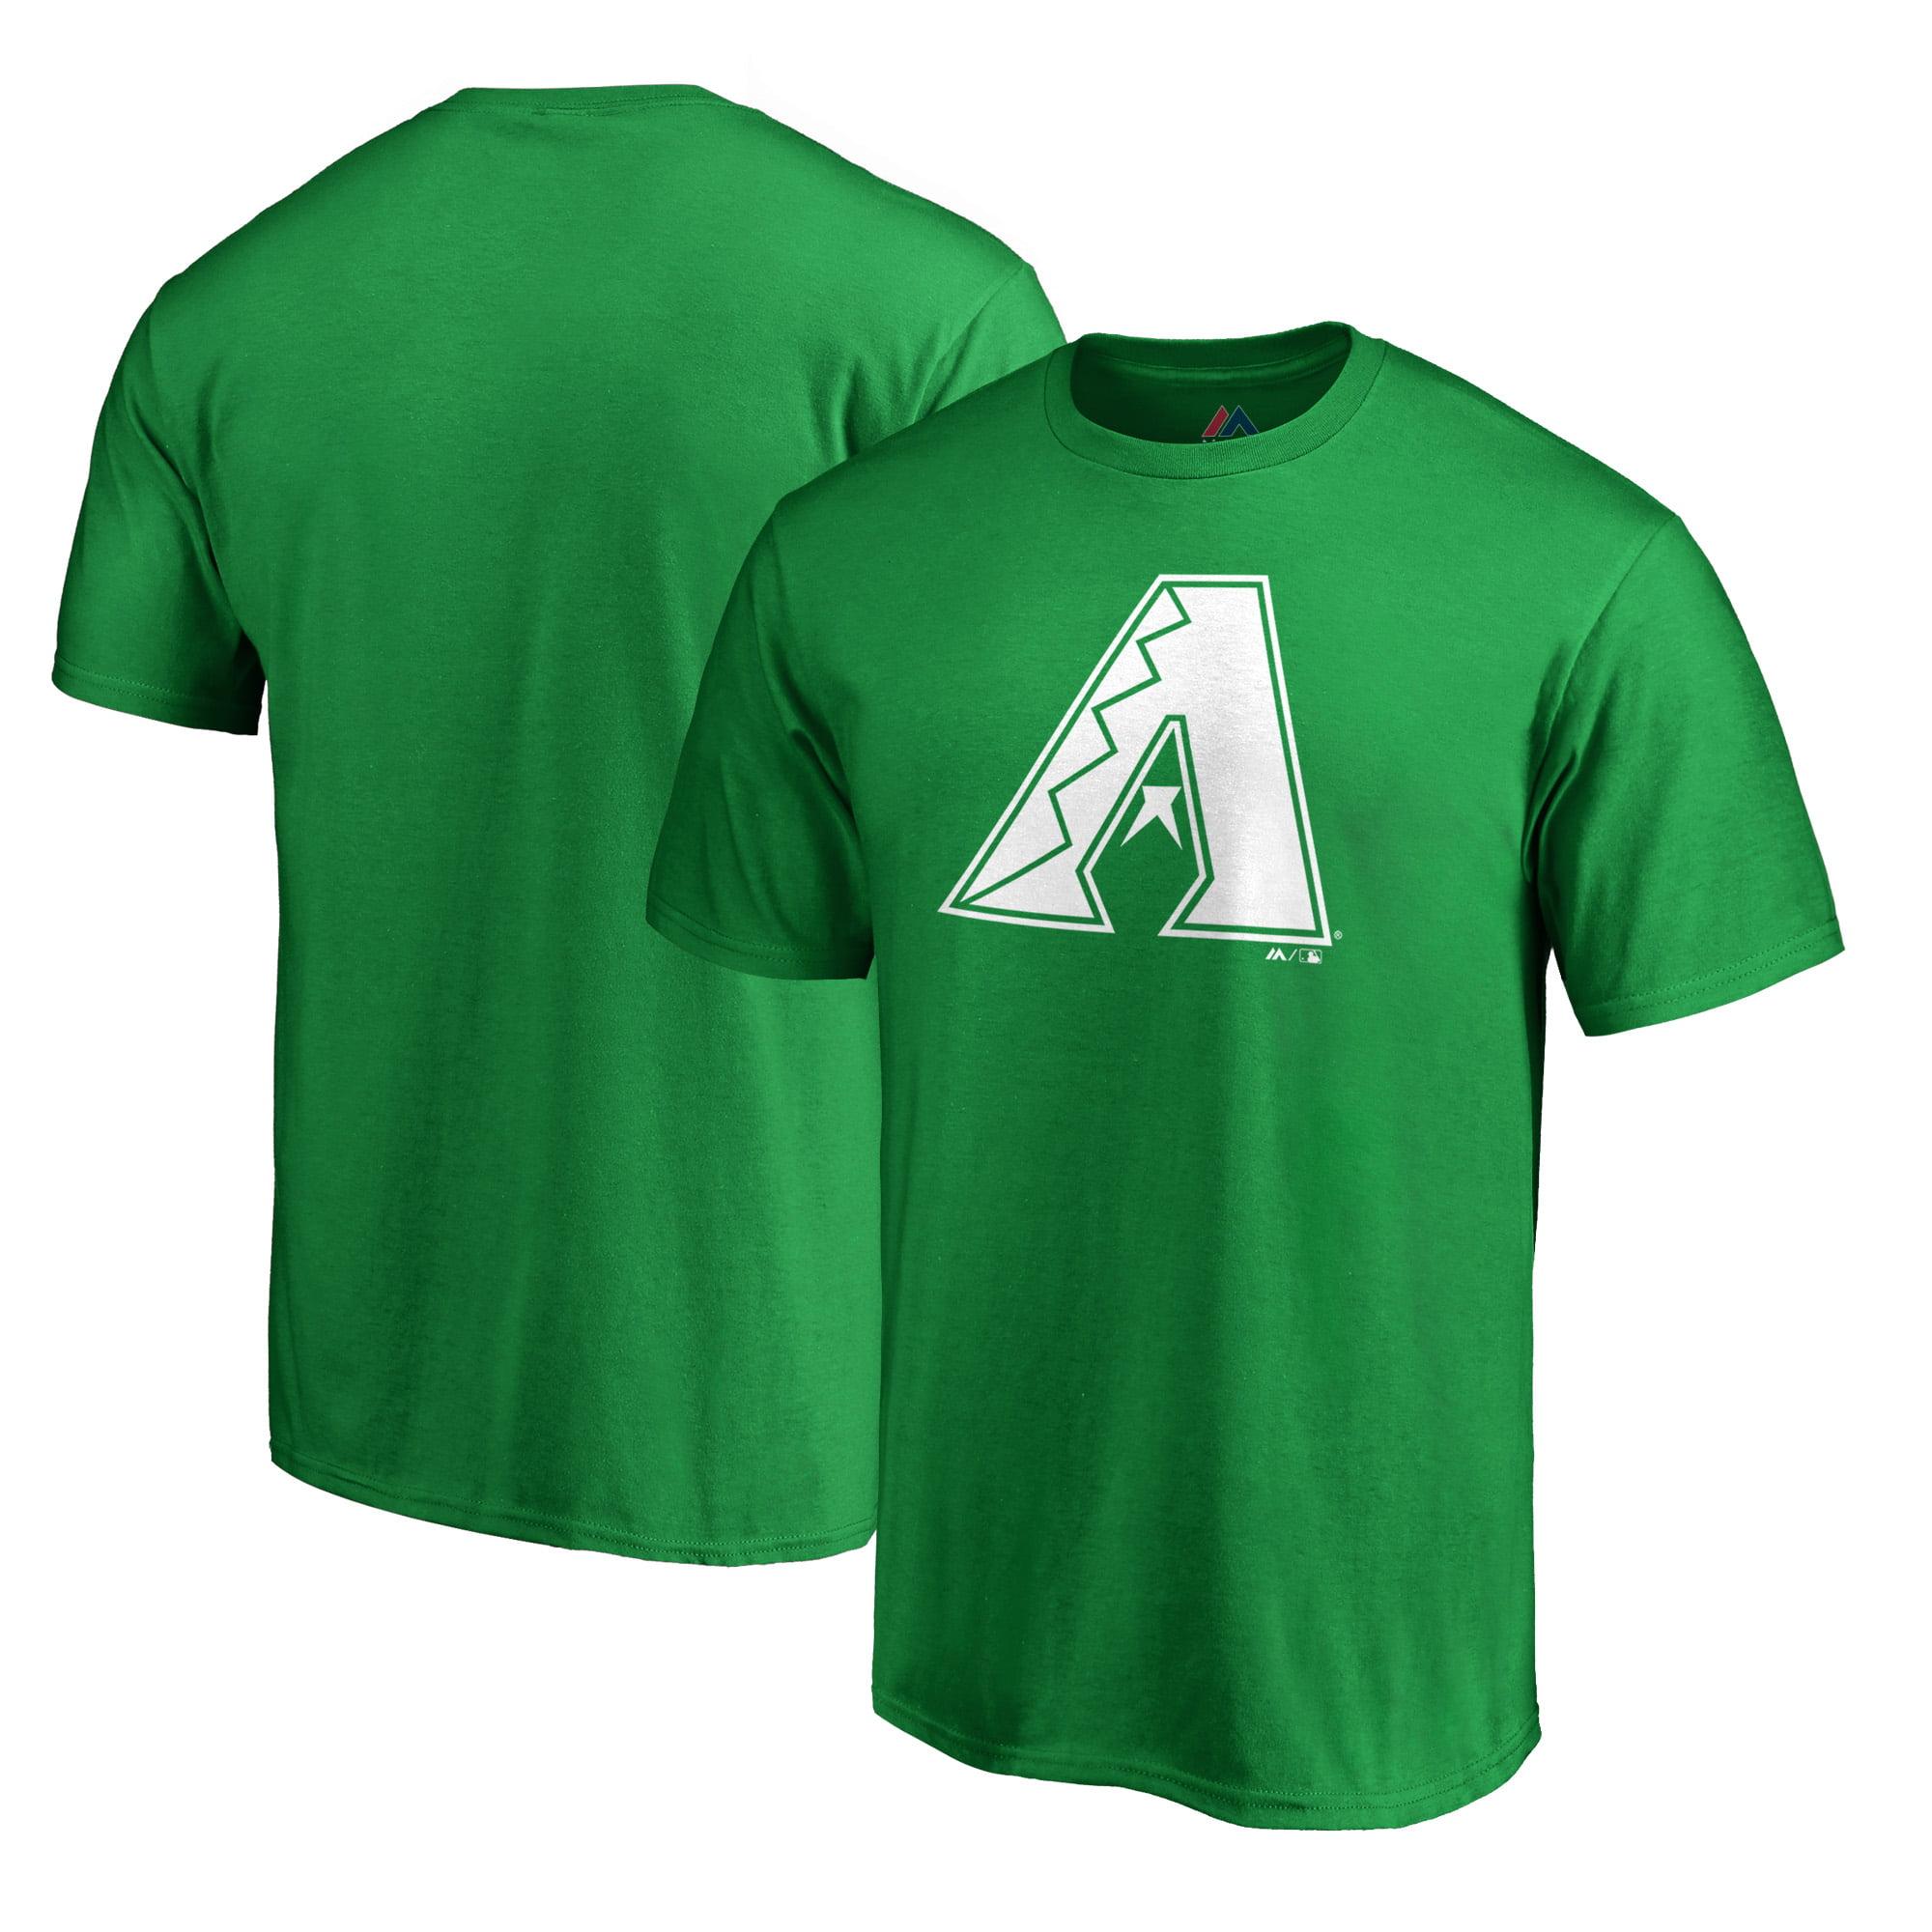 Arizona Diamondbacks Majestic St. Patrick's Day White Logo T-Shirt - Kelly Green